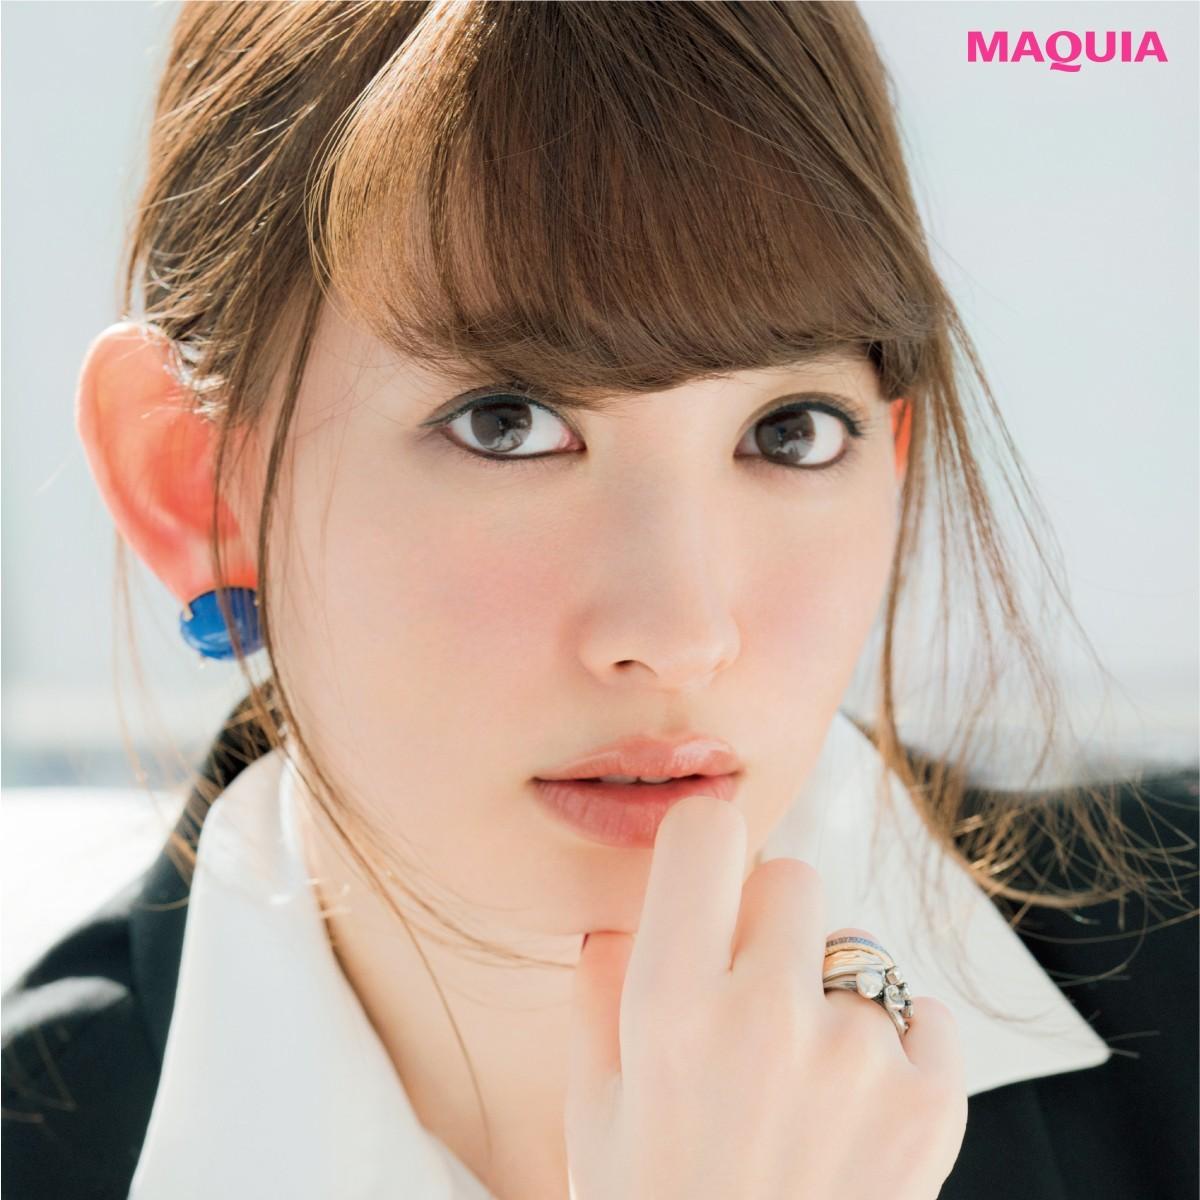 https://maquia.hpplus.jp/keyword/OVKUBVE